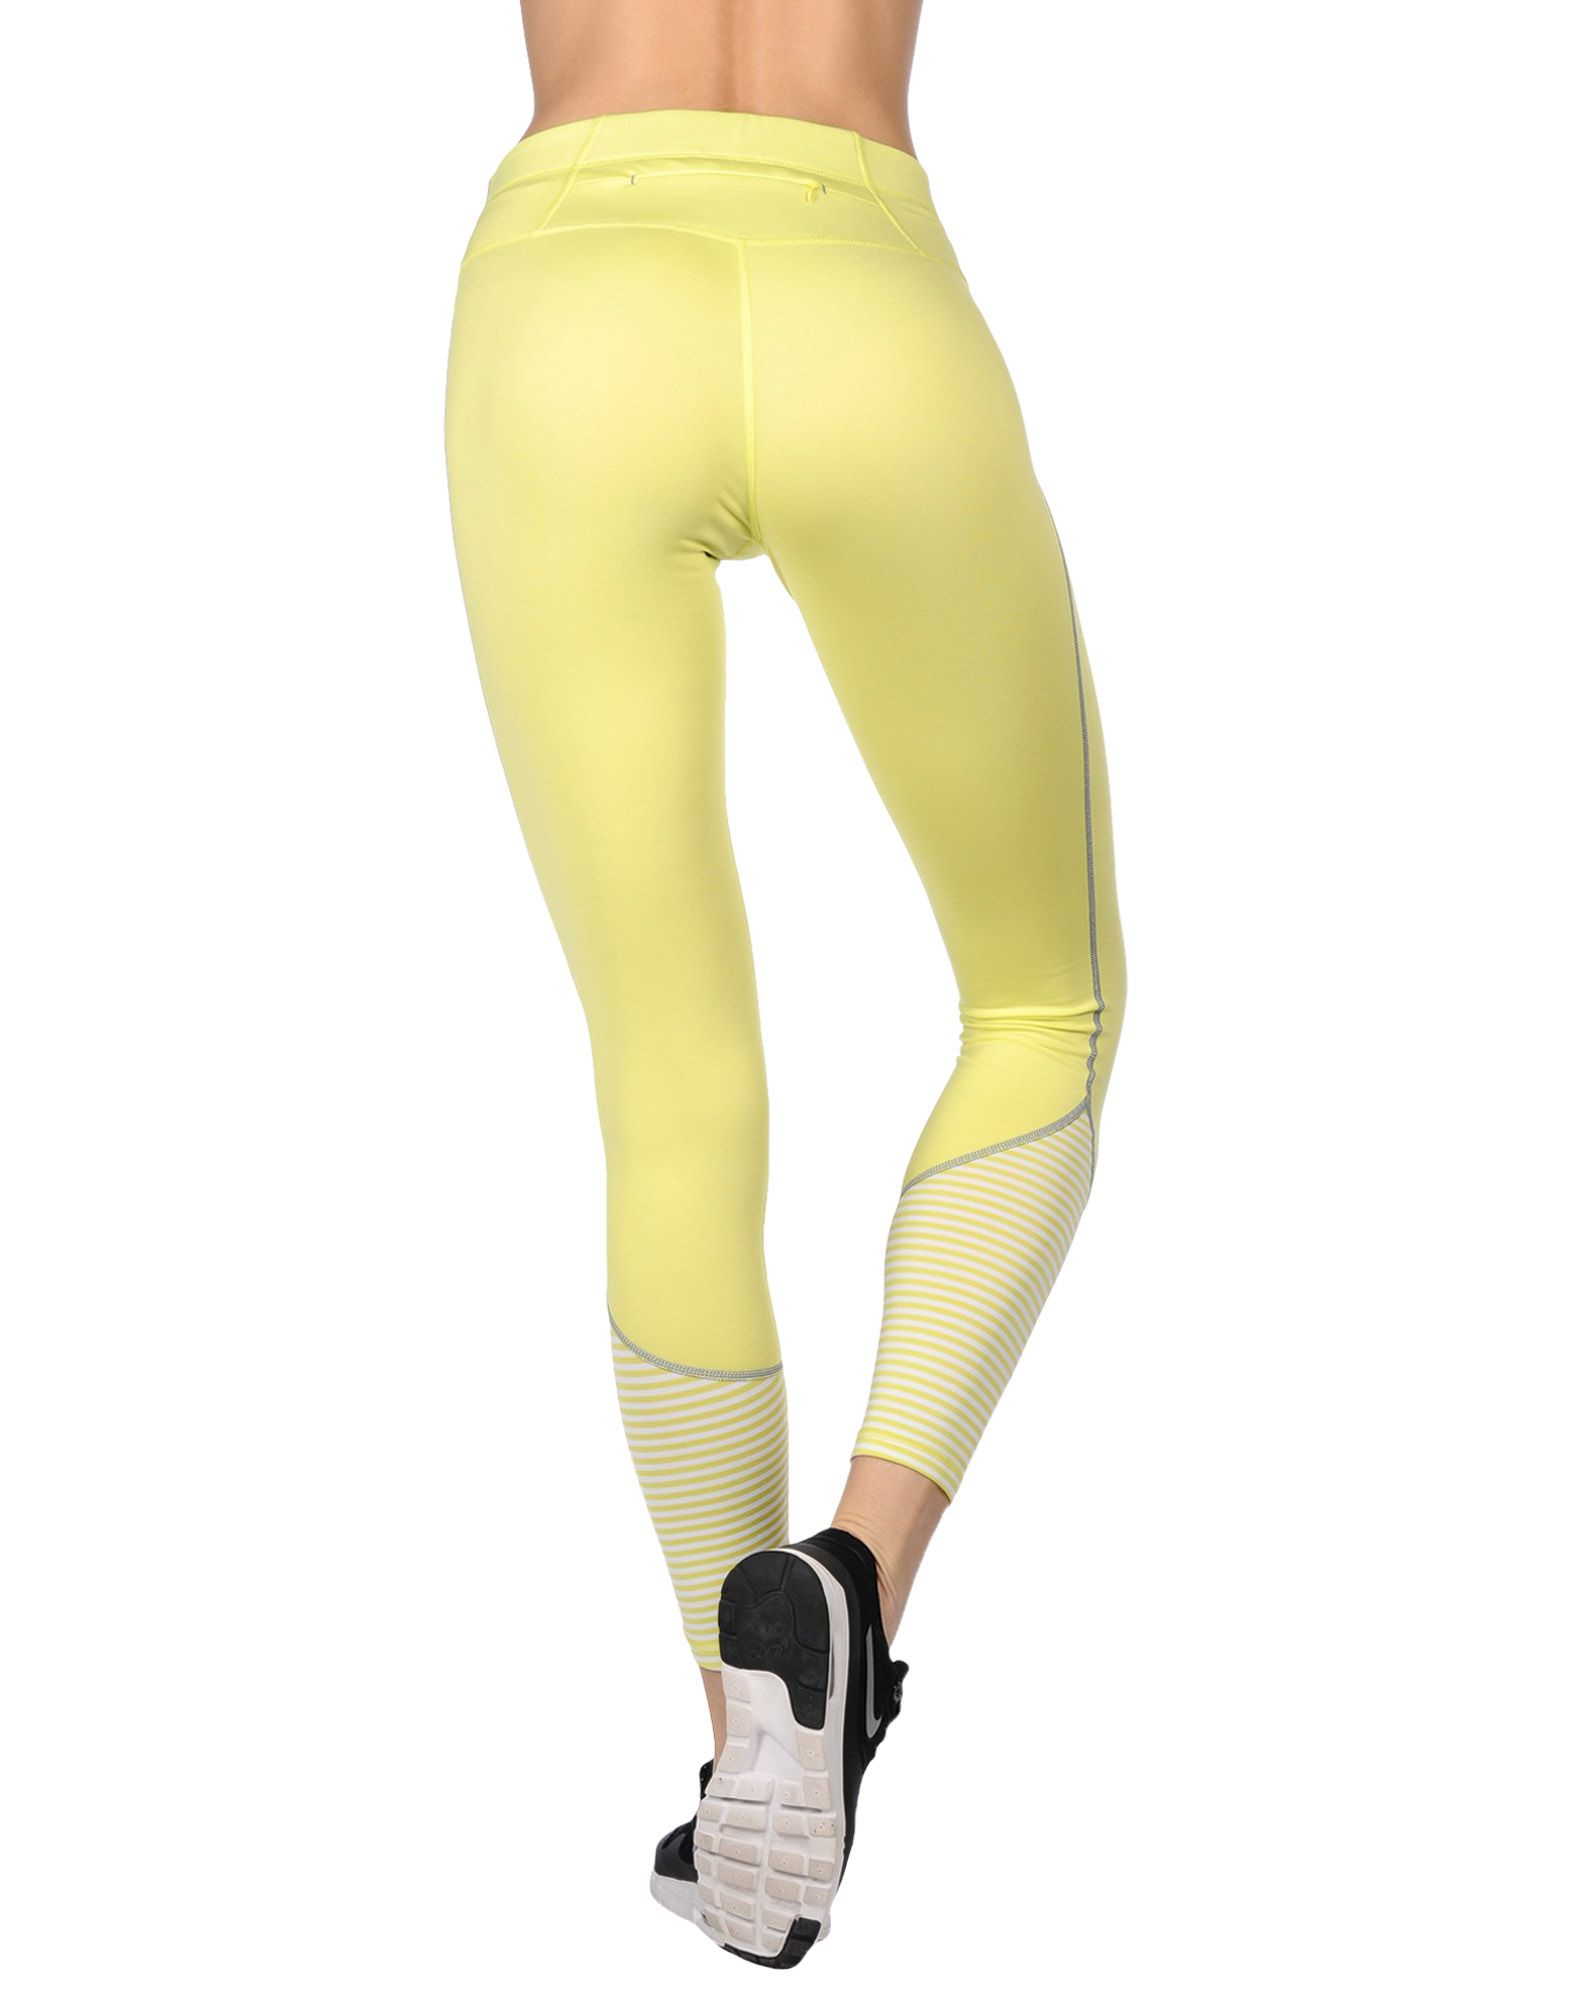 Roxy Synthetic Leggings in Yellow